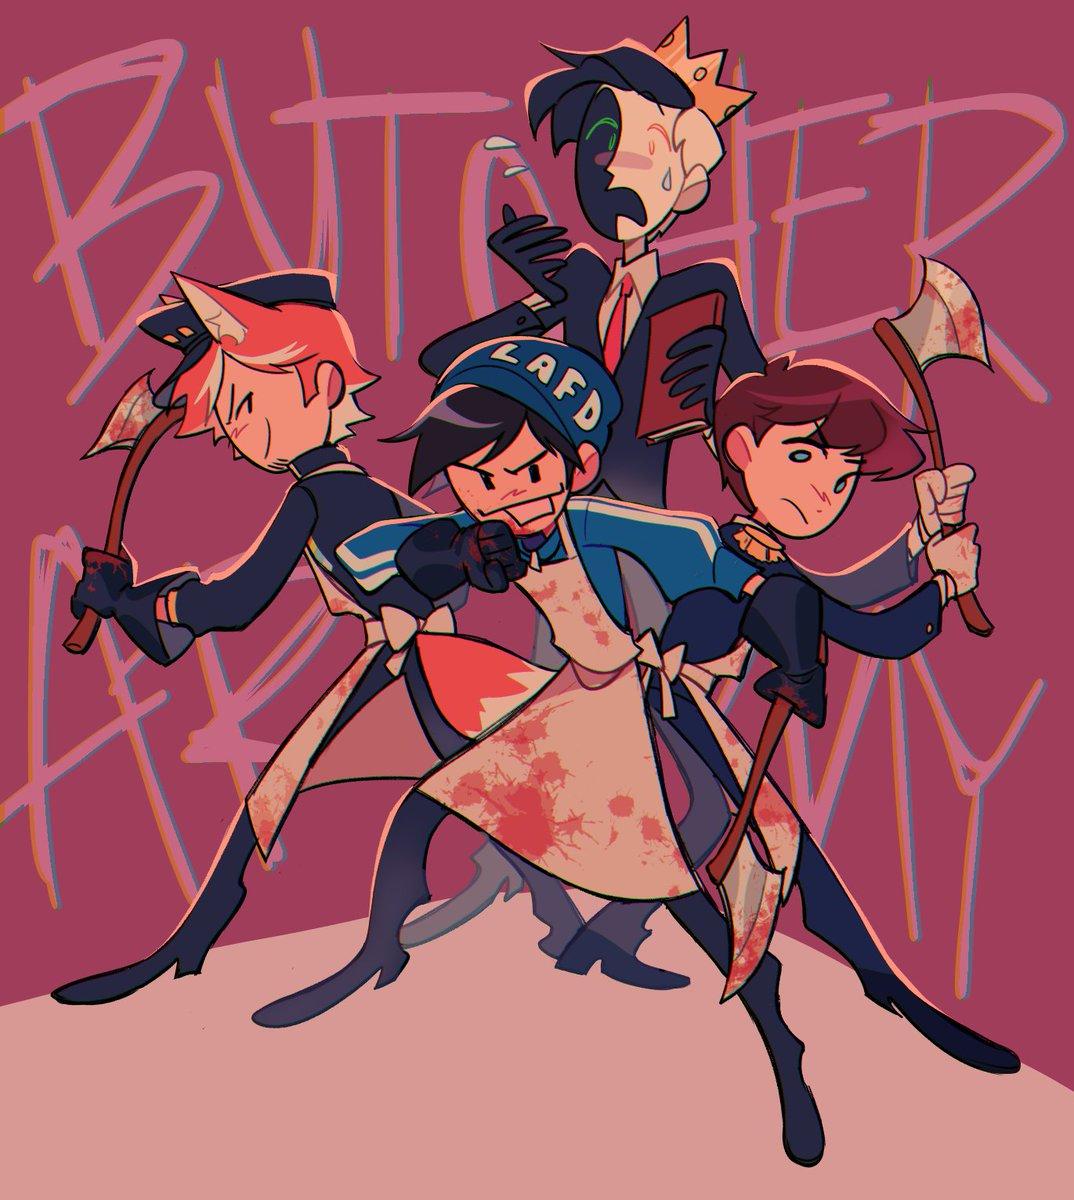 Butcher army #tubbo #ranboo #quackity #fundy #mcytfanart #dreamsmpfanart #dreamsmp #mcyt #dsmp